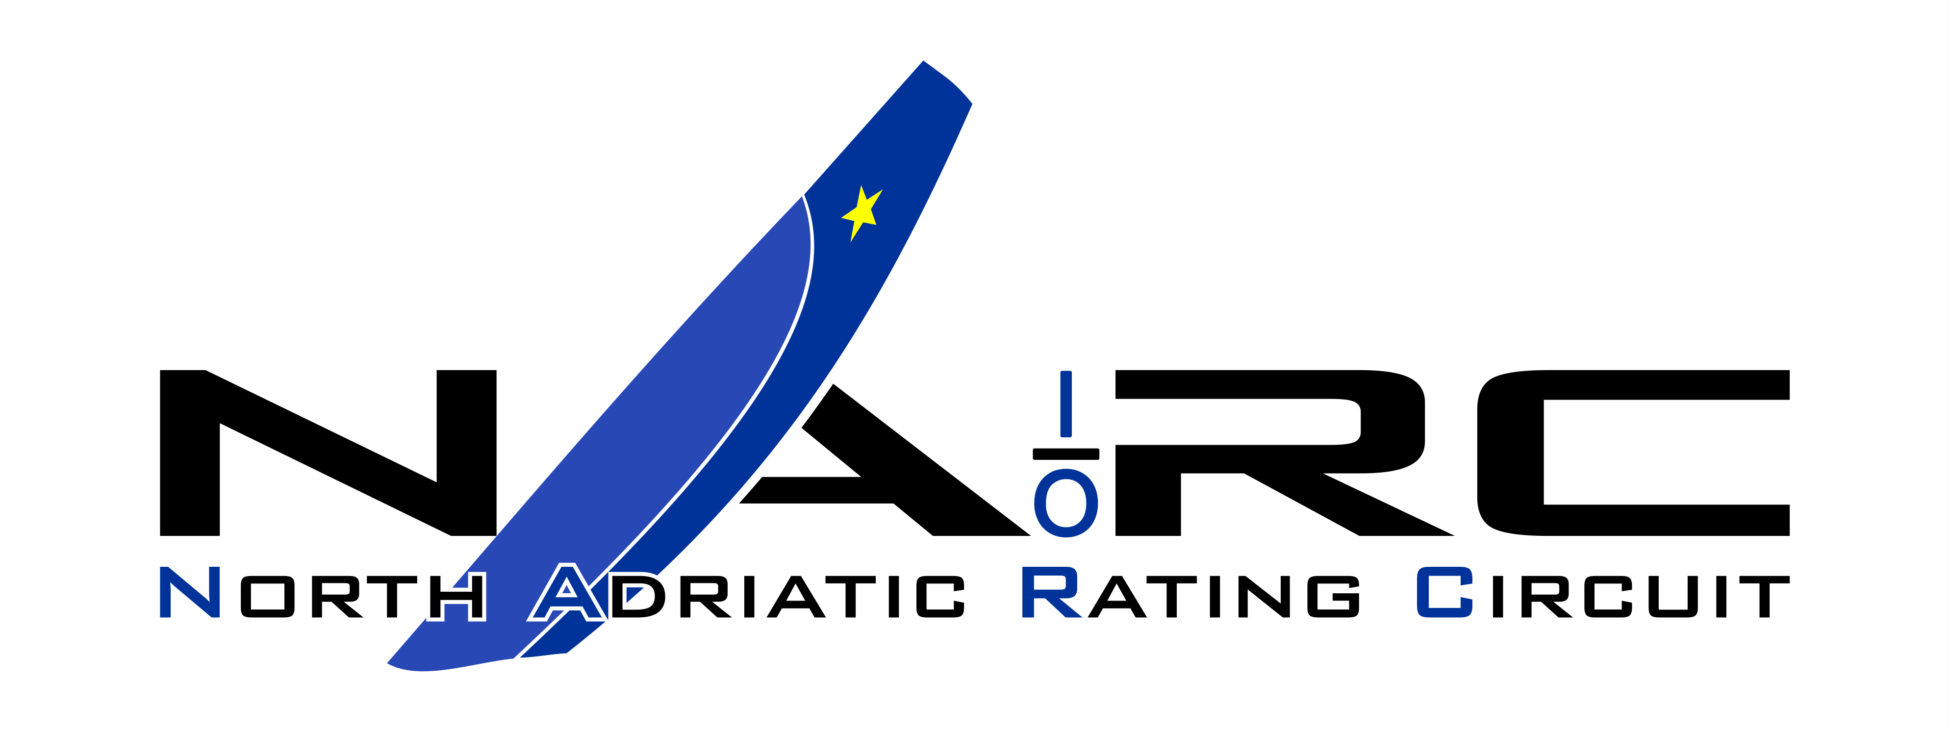 North Adriatic Rating Circuit – NARC